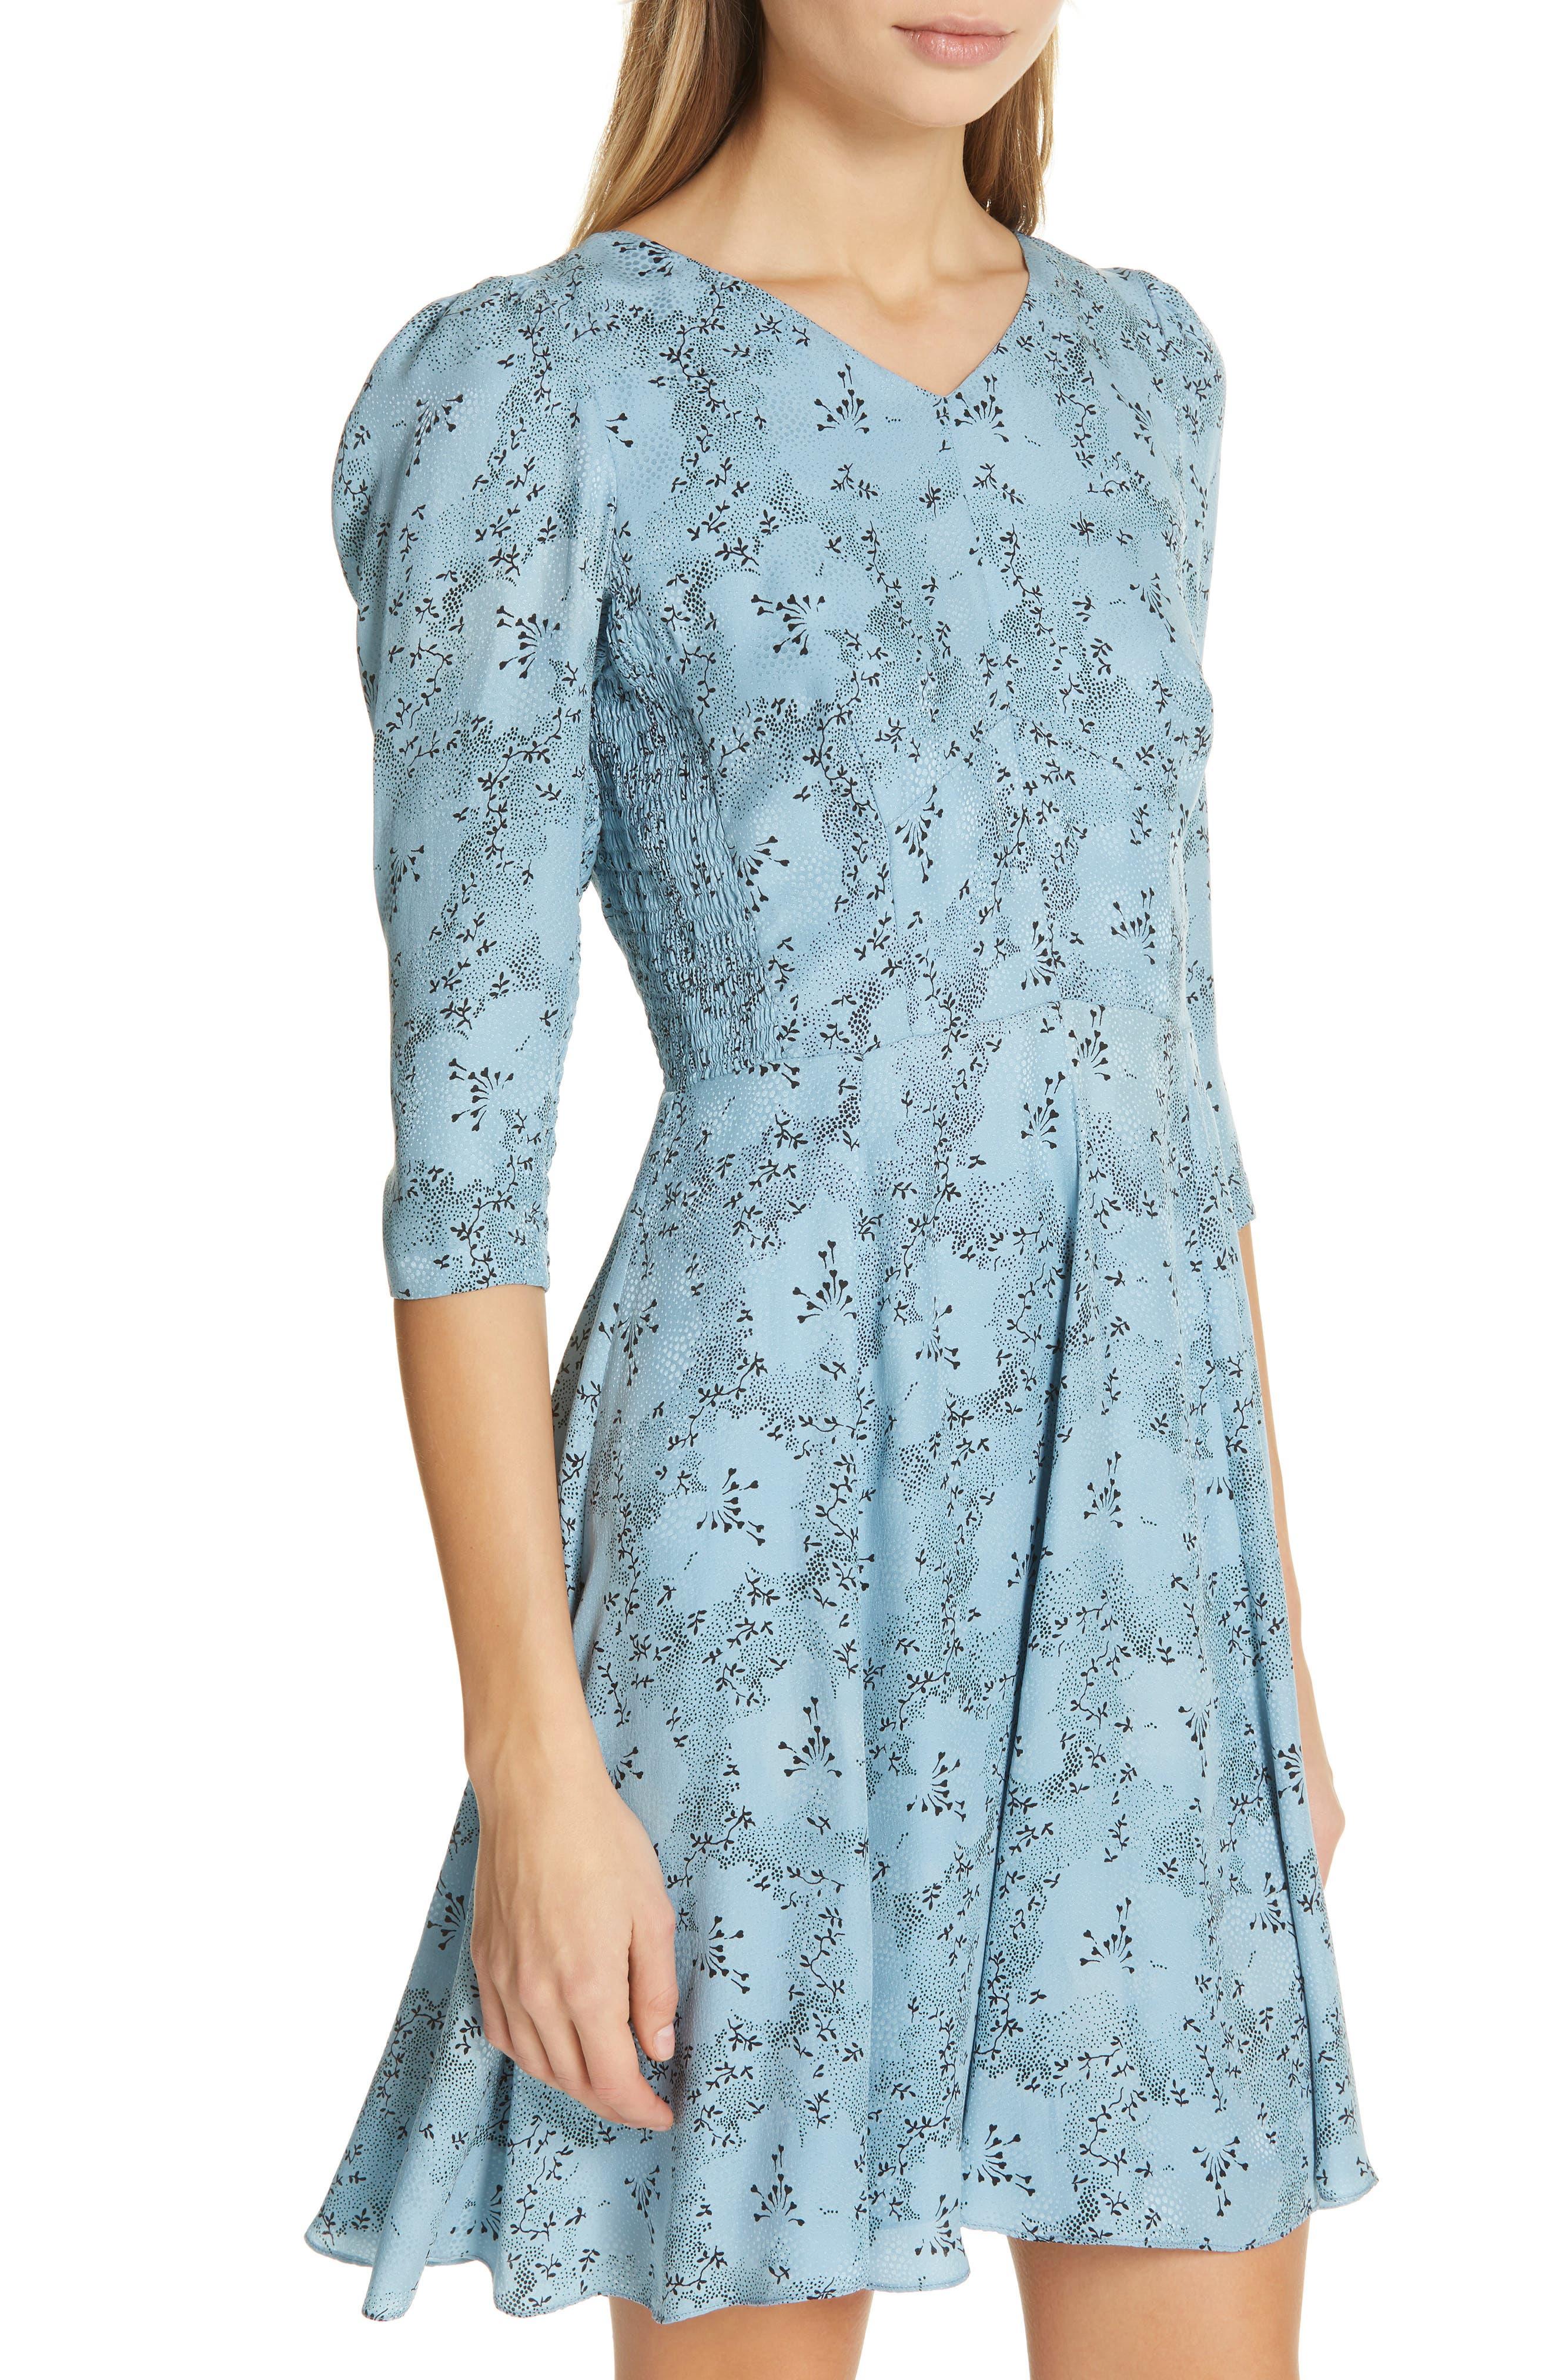 Gianna Floral Silk Dress,                             Alternate thumbnail 4, color,                             LAGOON COMBO